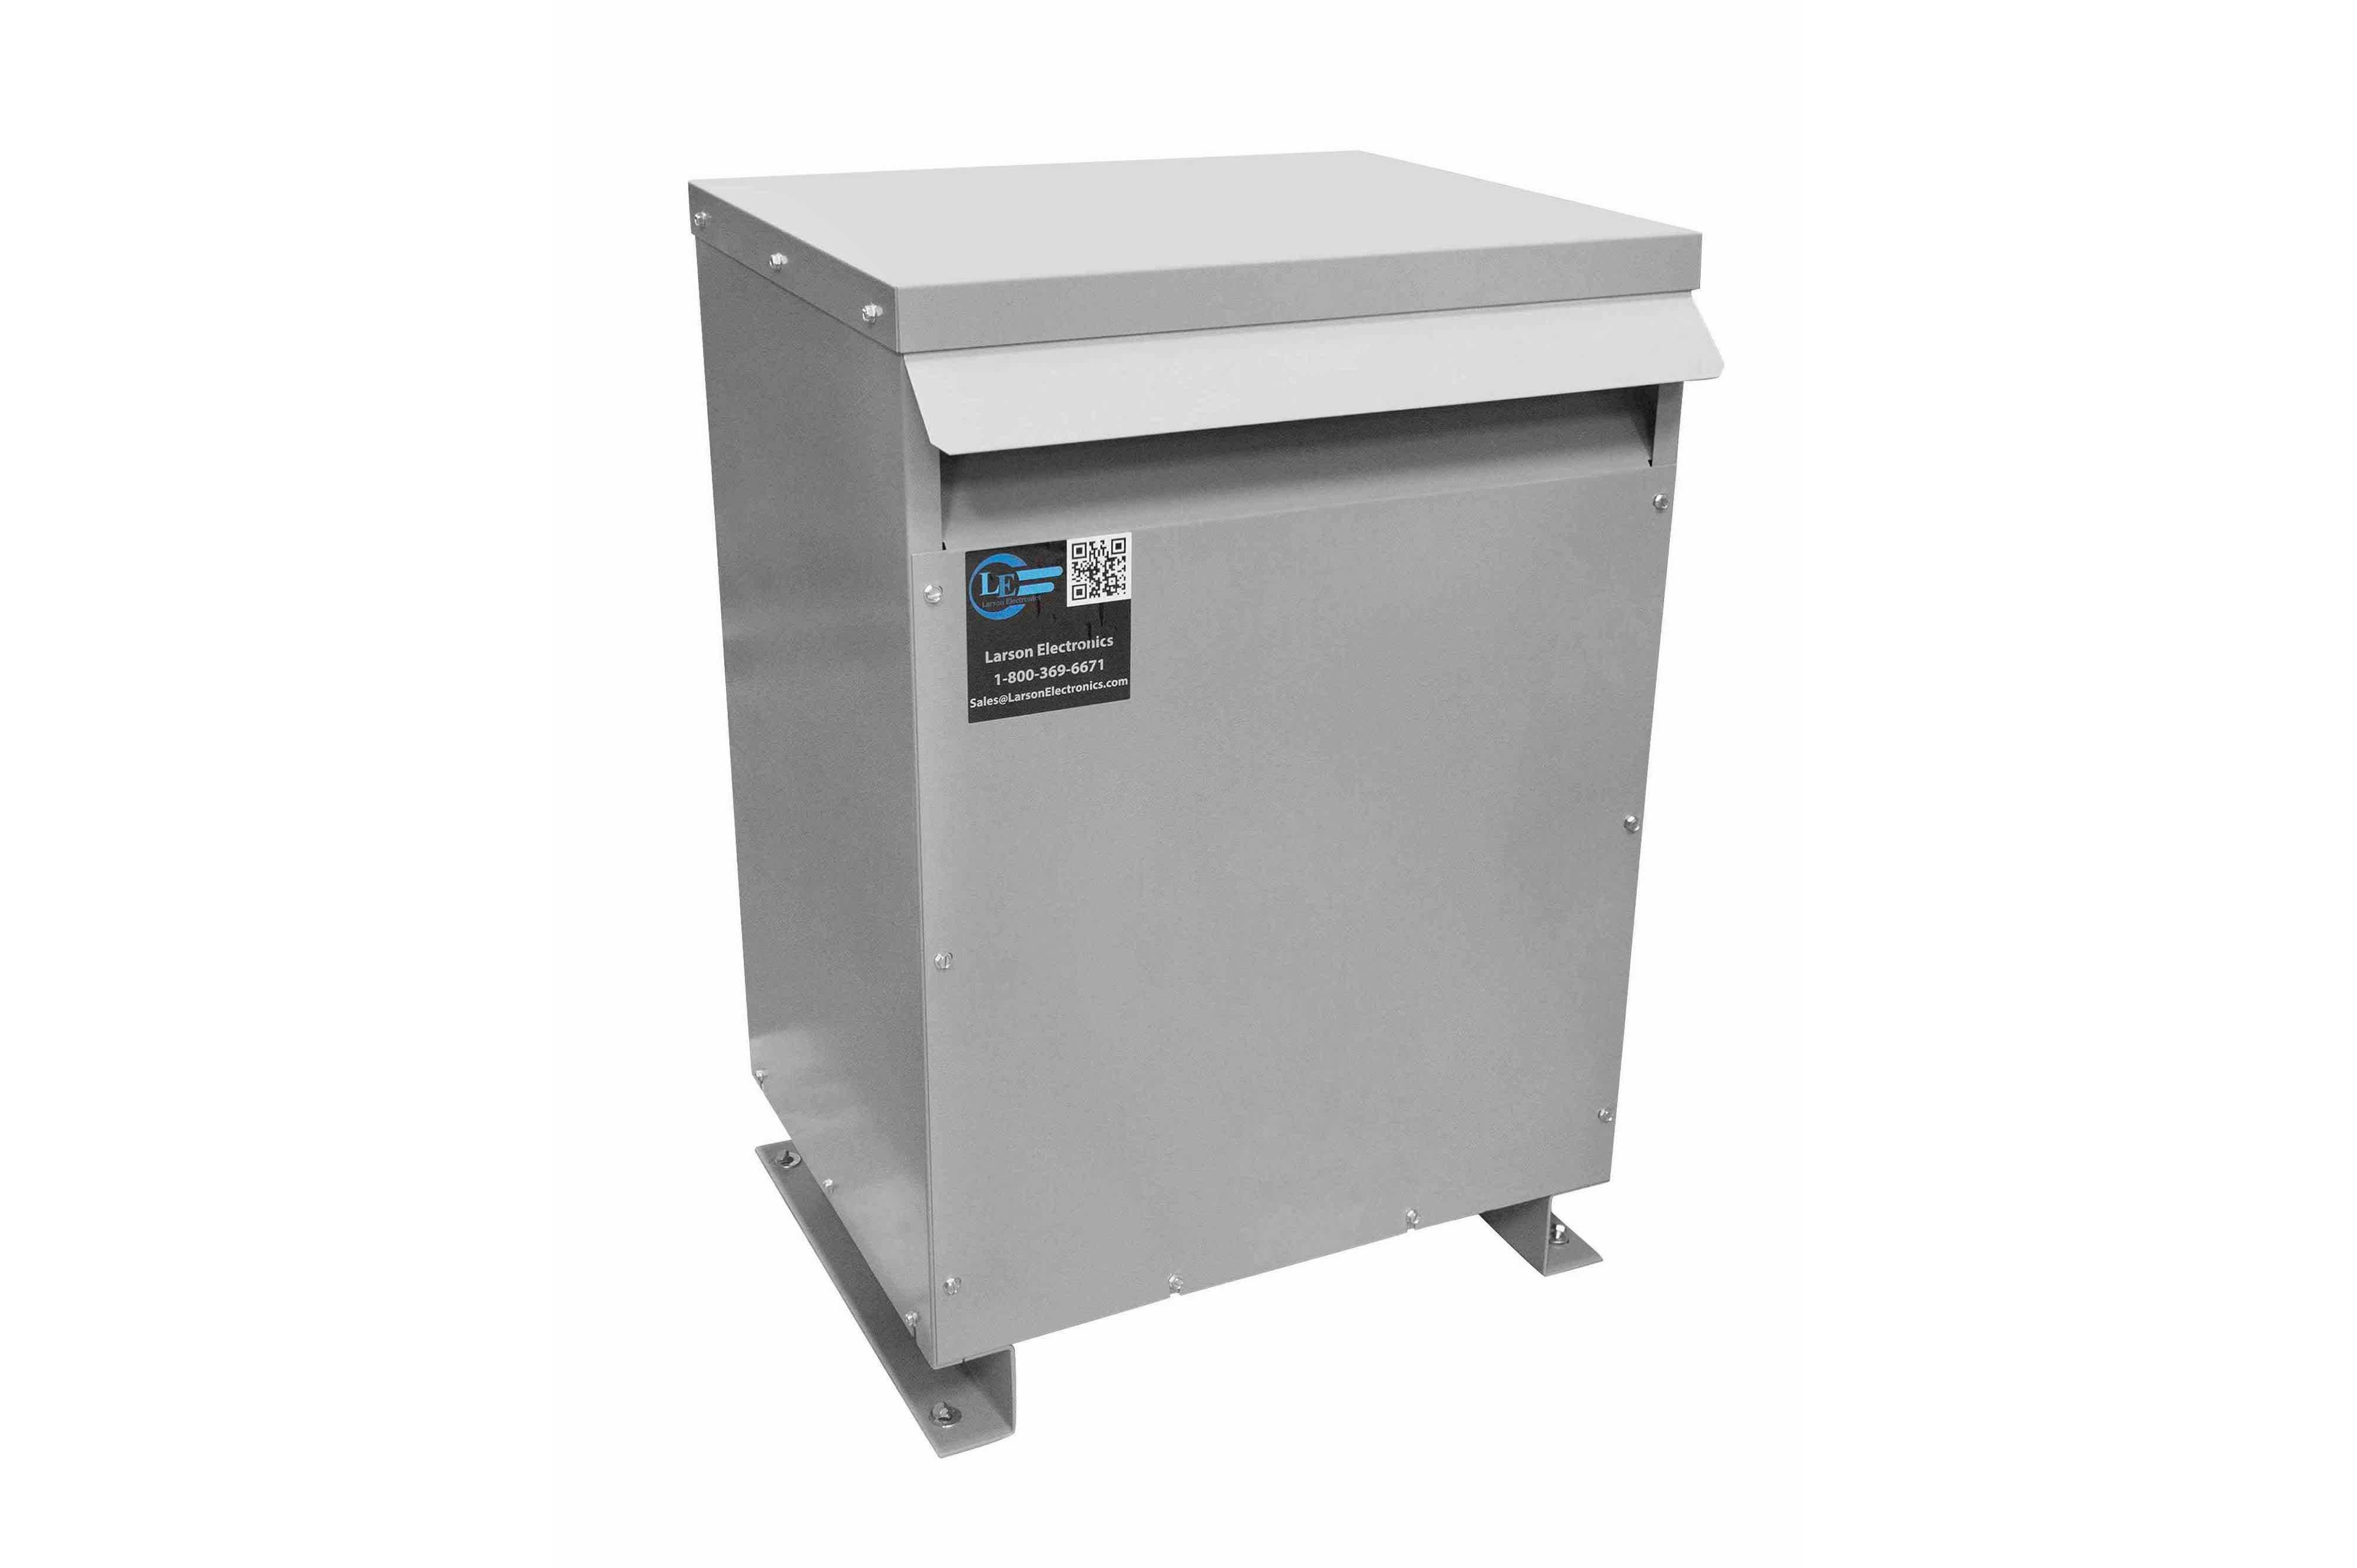 38 kVA 3PH Isolation Transformer, 400V Wye Primary, 240V/120 Delta Secondary, N3R, Ventilated, 60 Hz